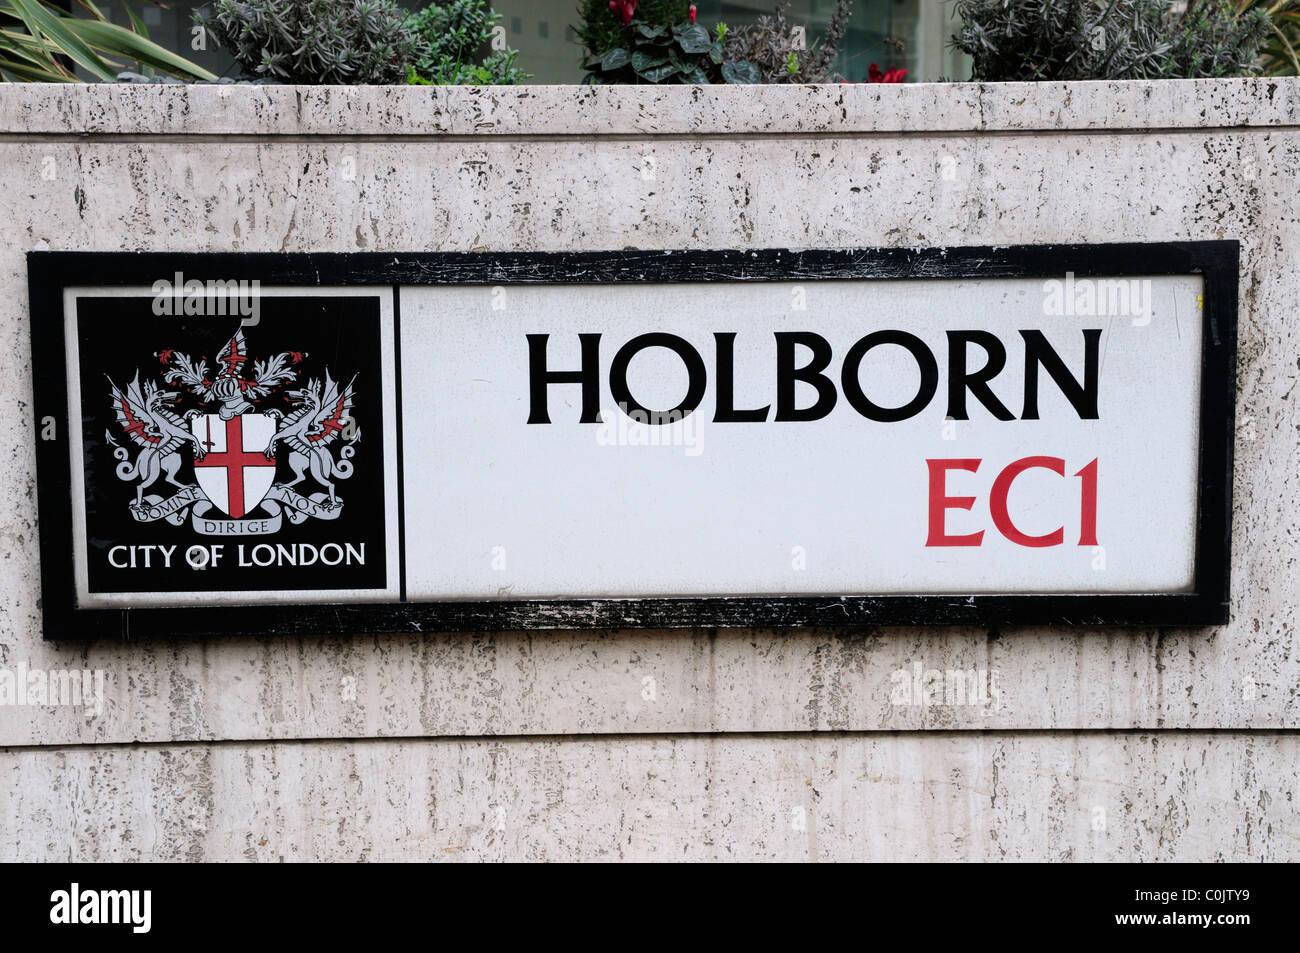 Holborn EC1 Street Sign, London, England, UK - Stock Image